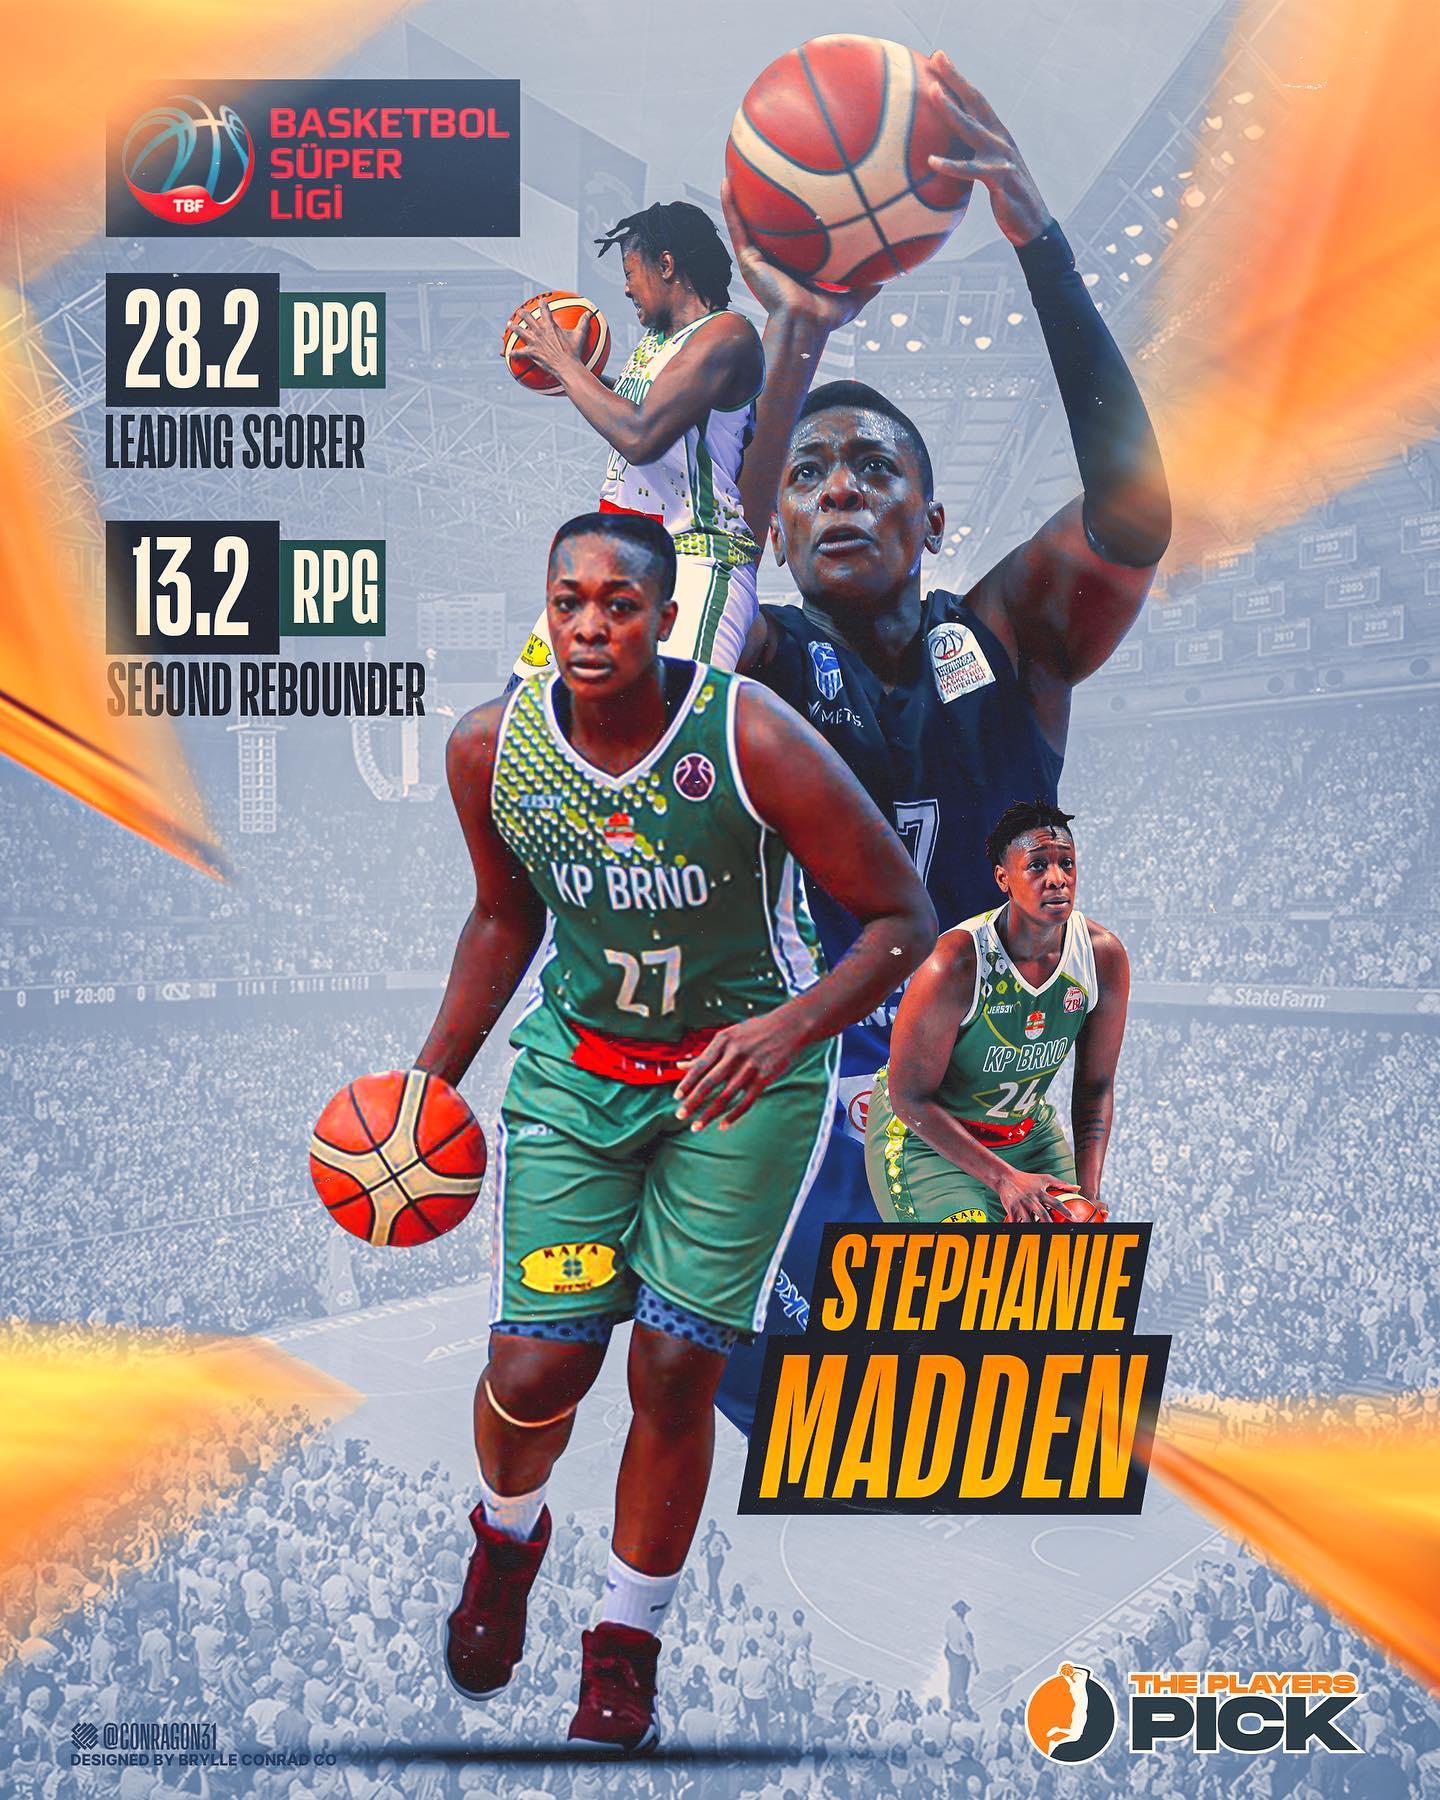 Stephanie Madden